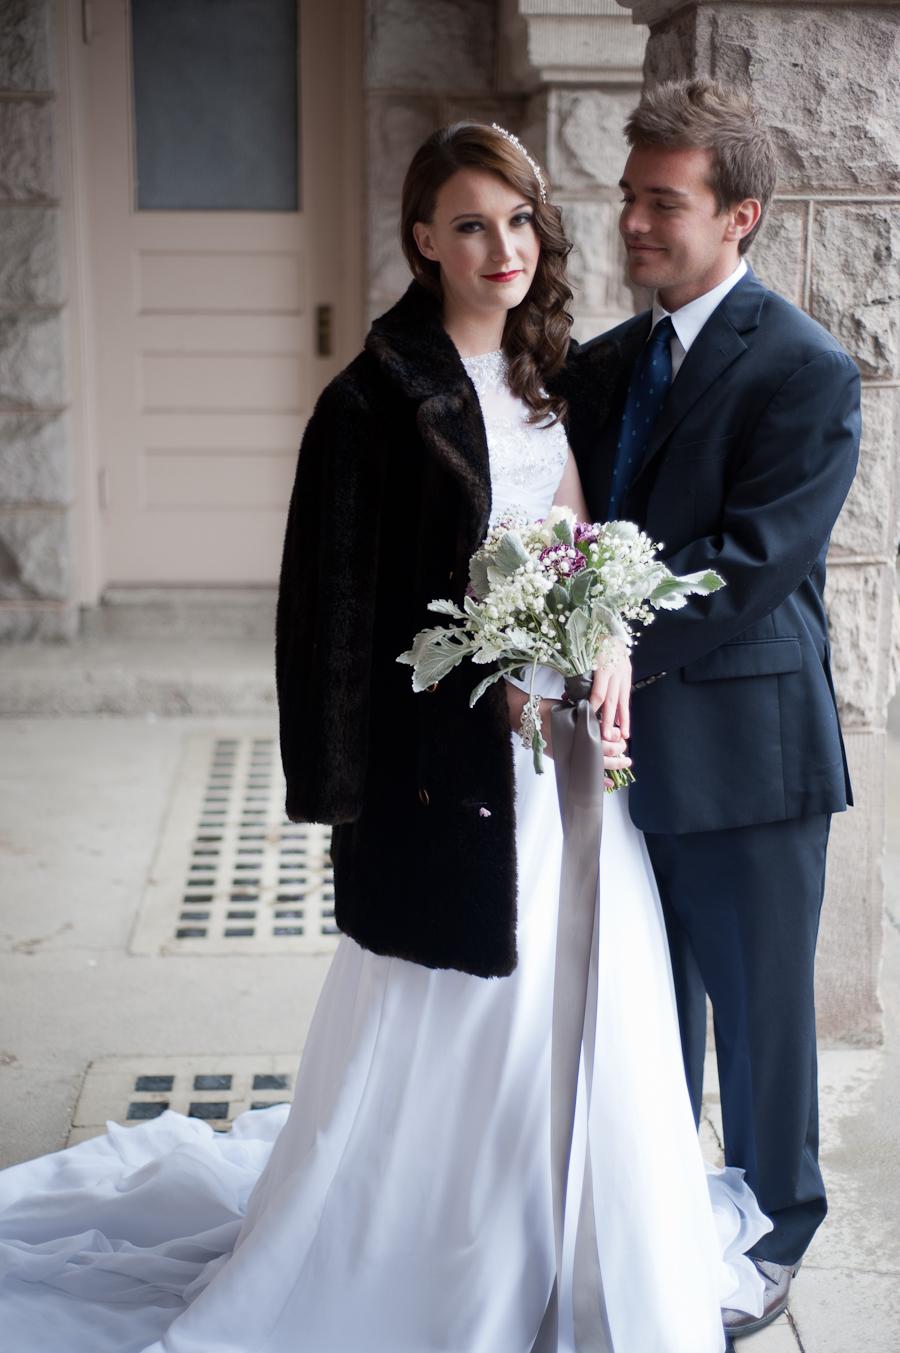 Susannah_Deangelo_Antique_Silver_Music_Hall_Wedding-1.jpg